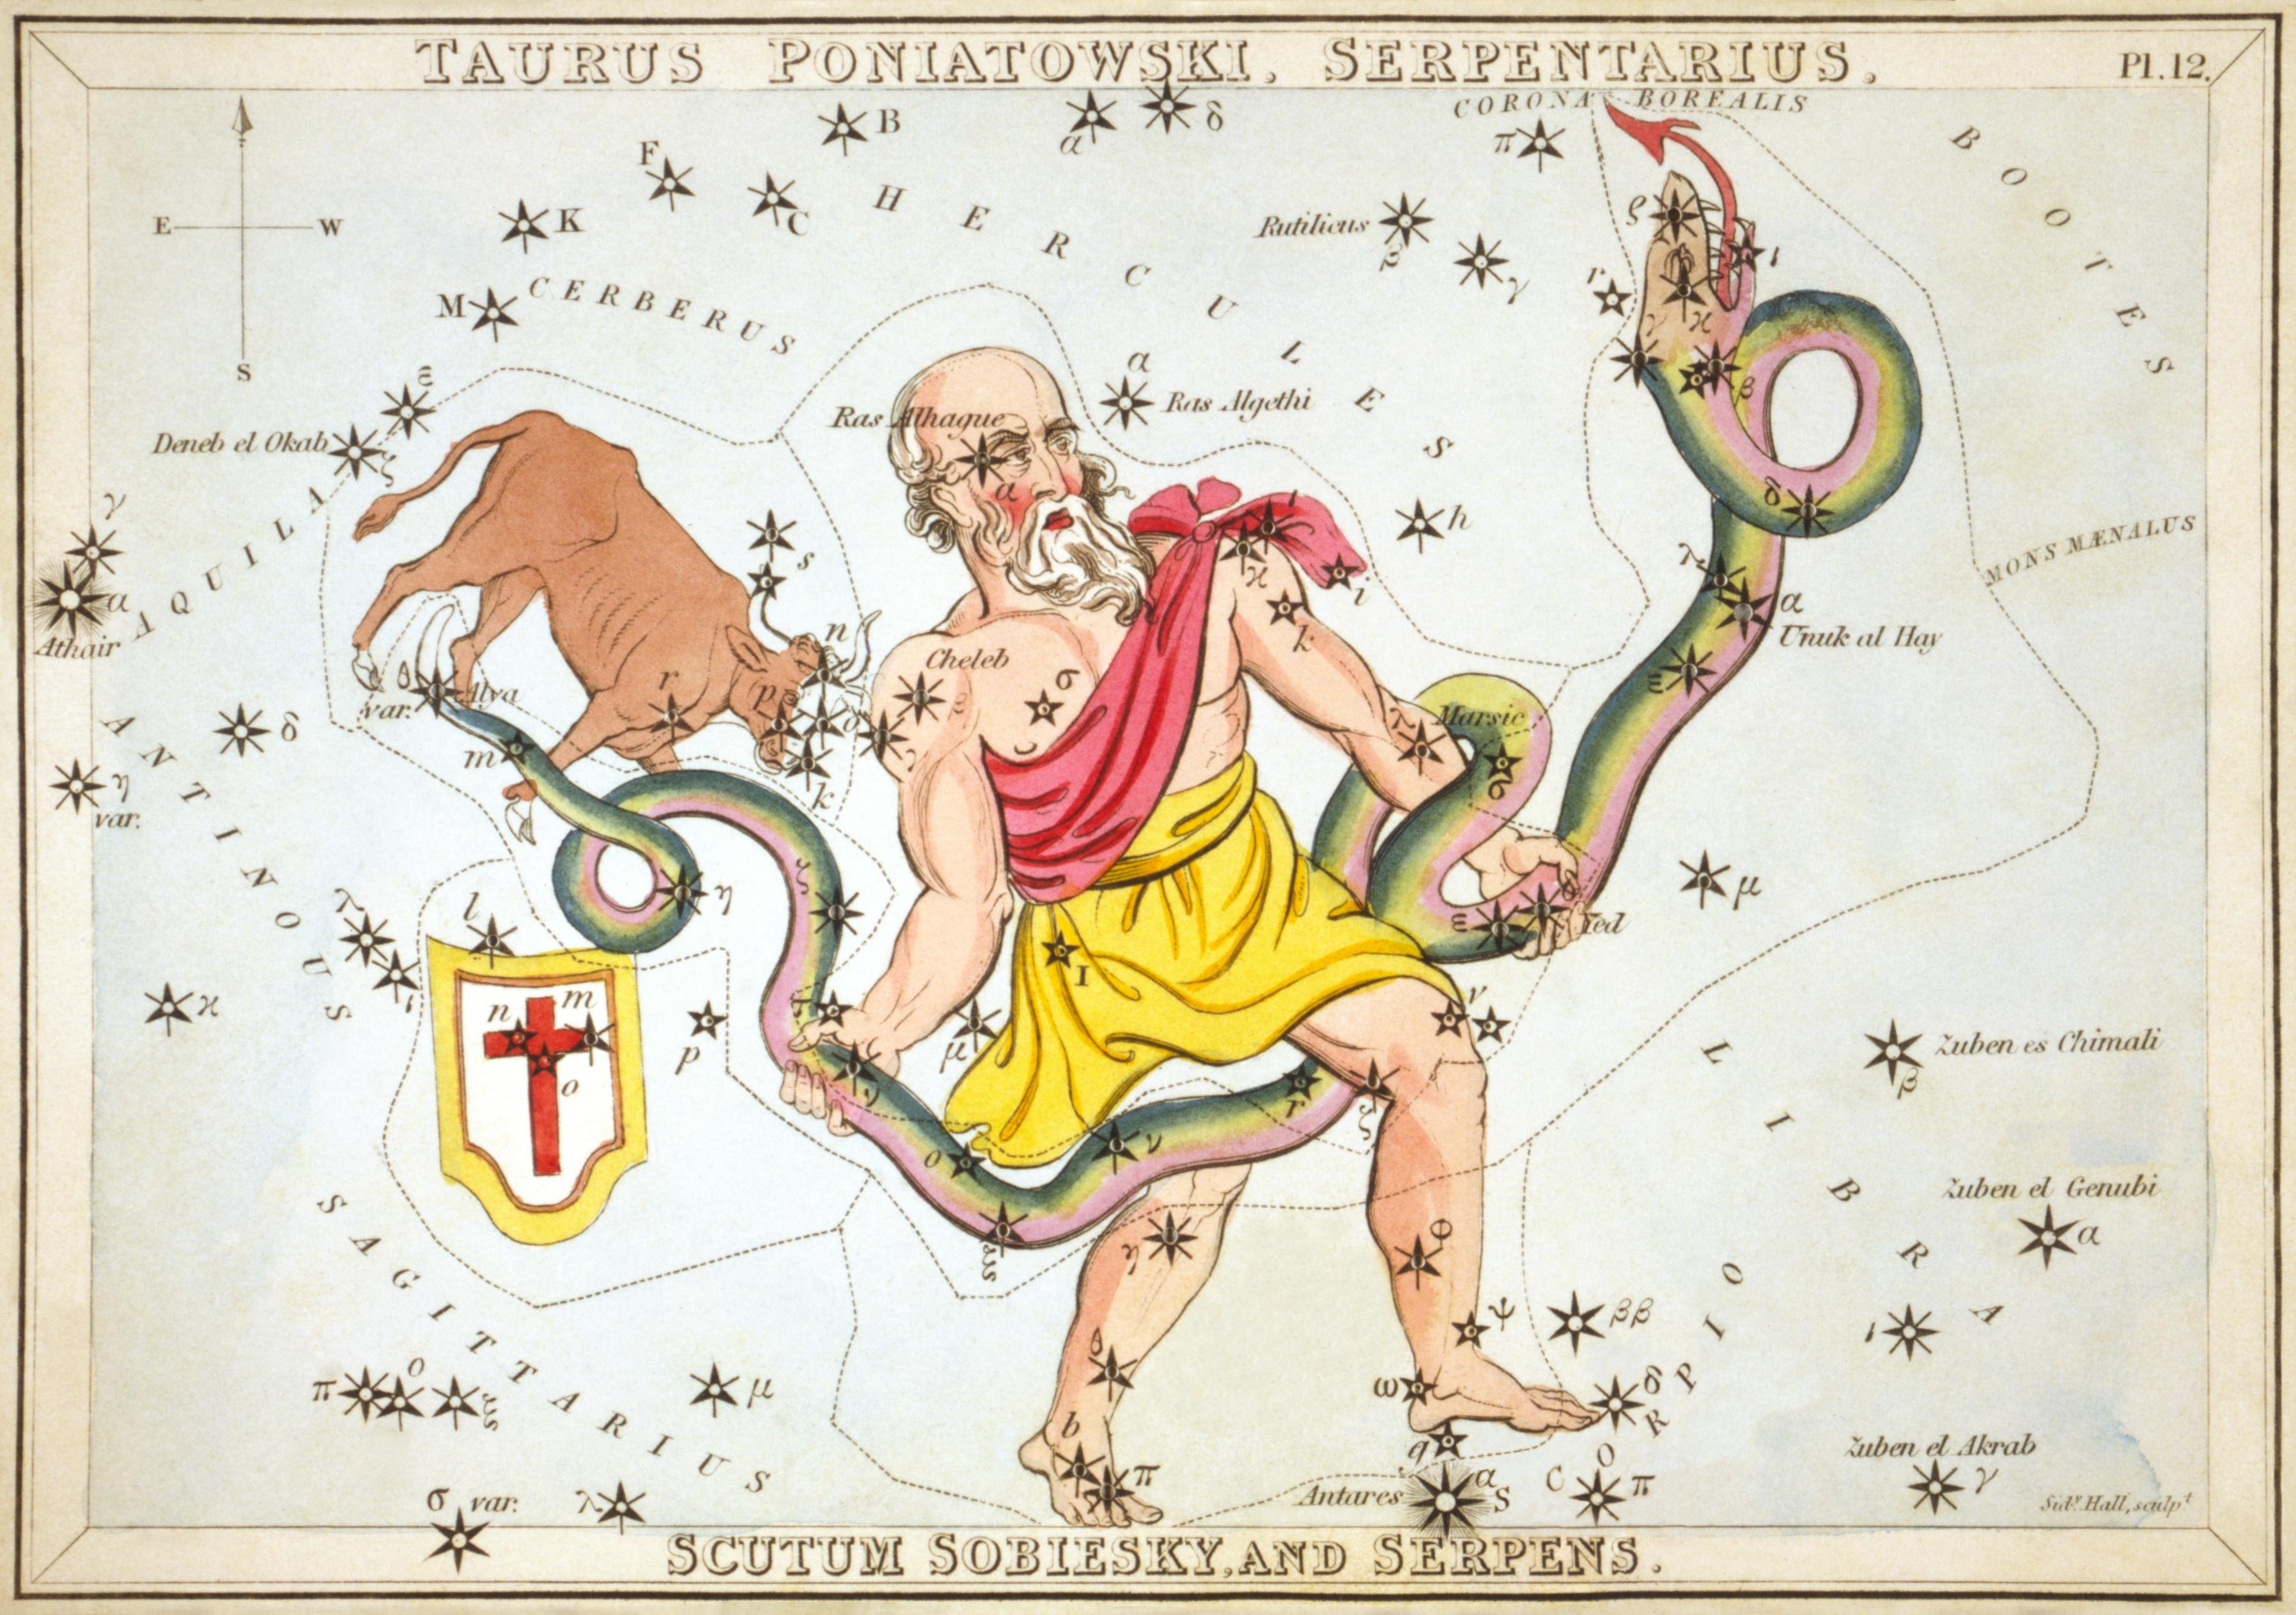 Urania's_Mirror_Serpentarius_Serpens